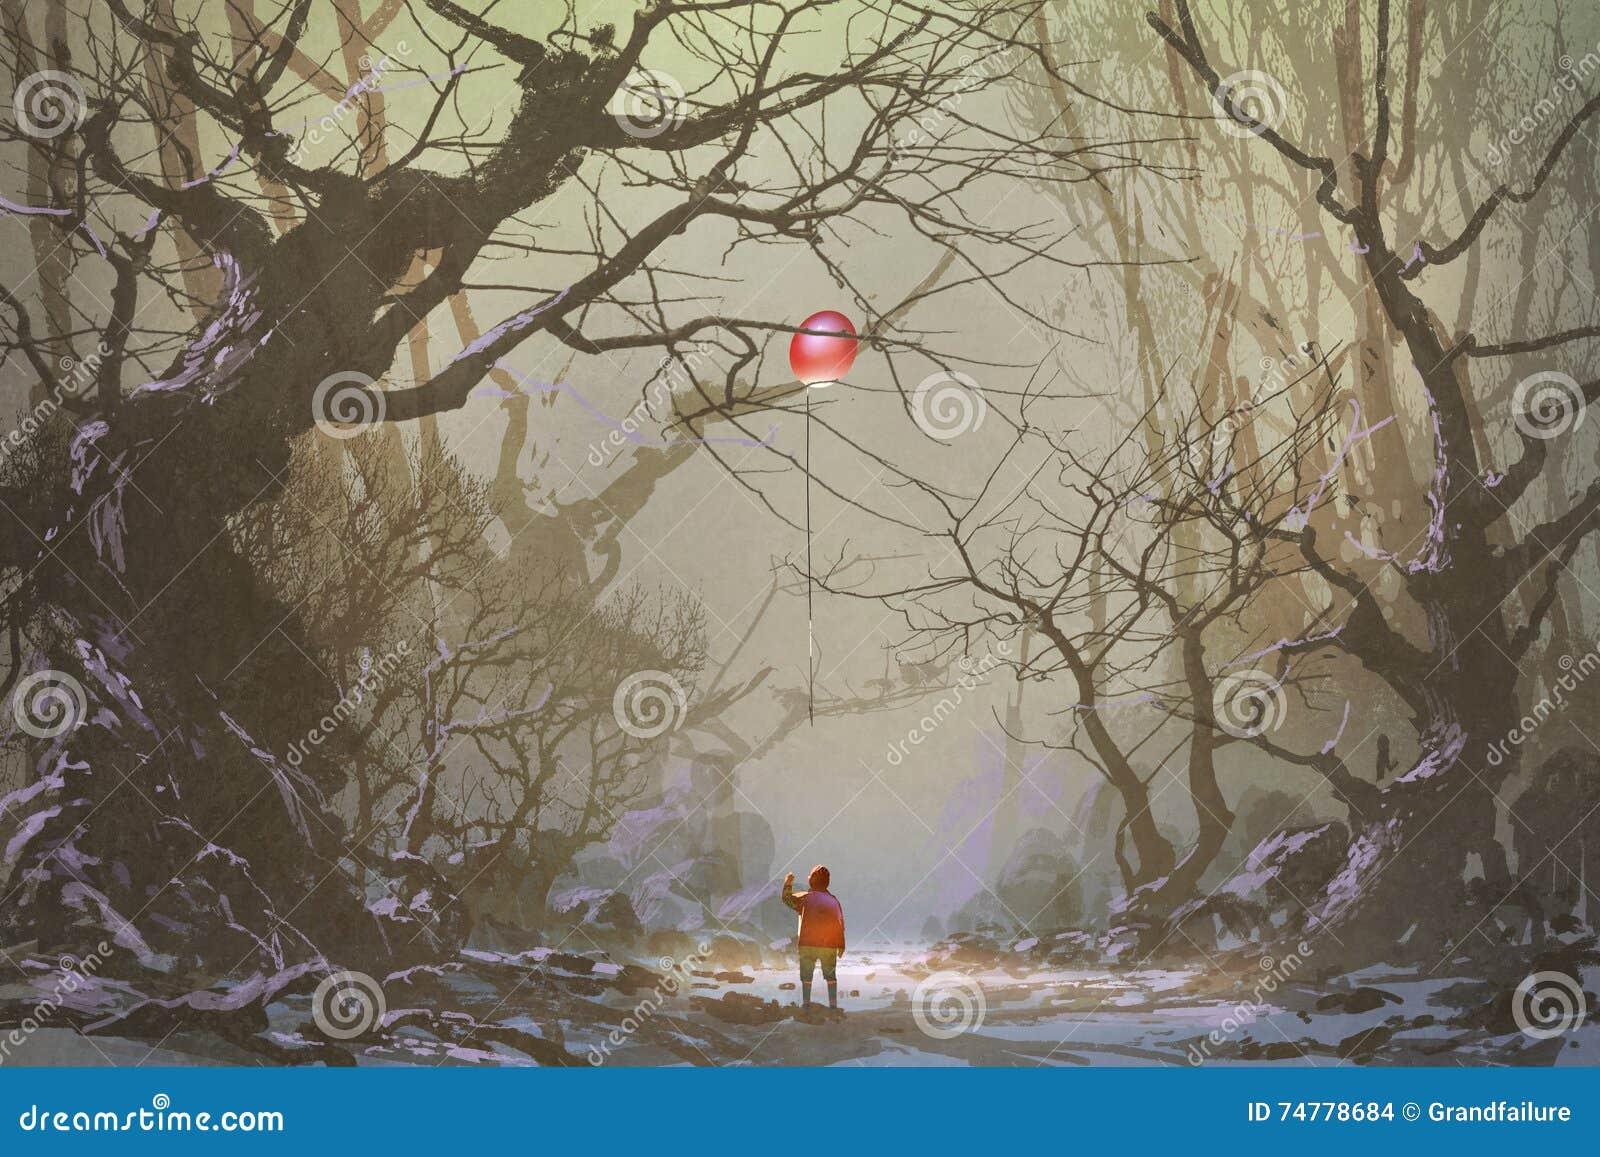 Boy looking up red balloon stuck in a tree branchesalone in dark forestillustrationdigital painting